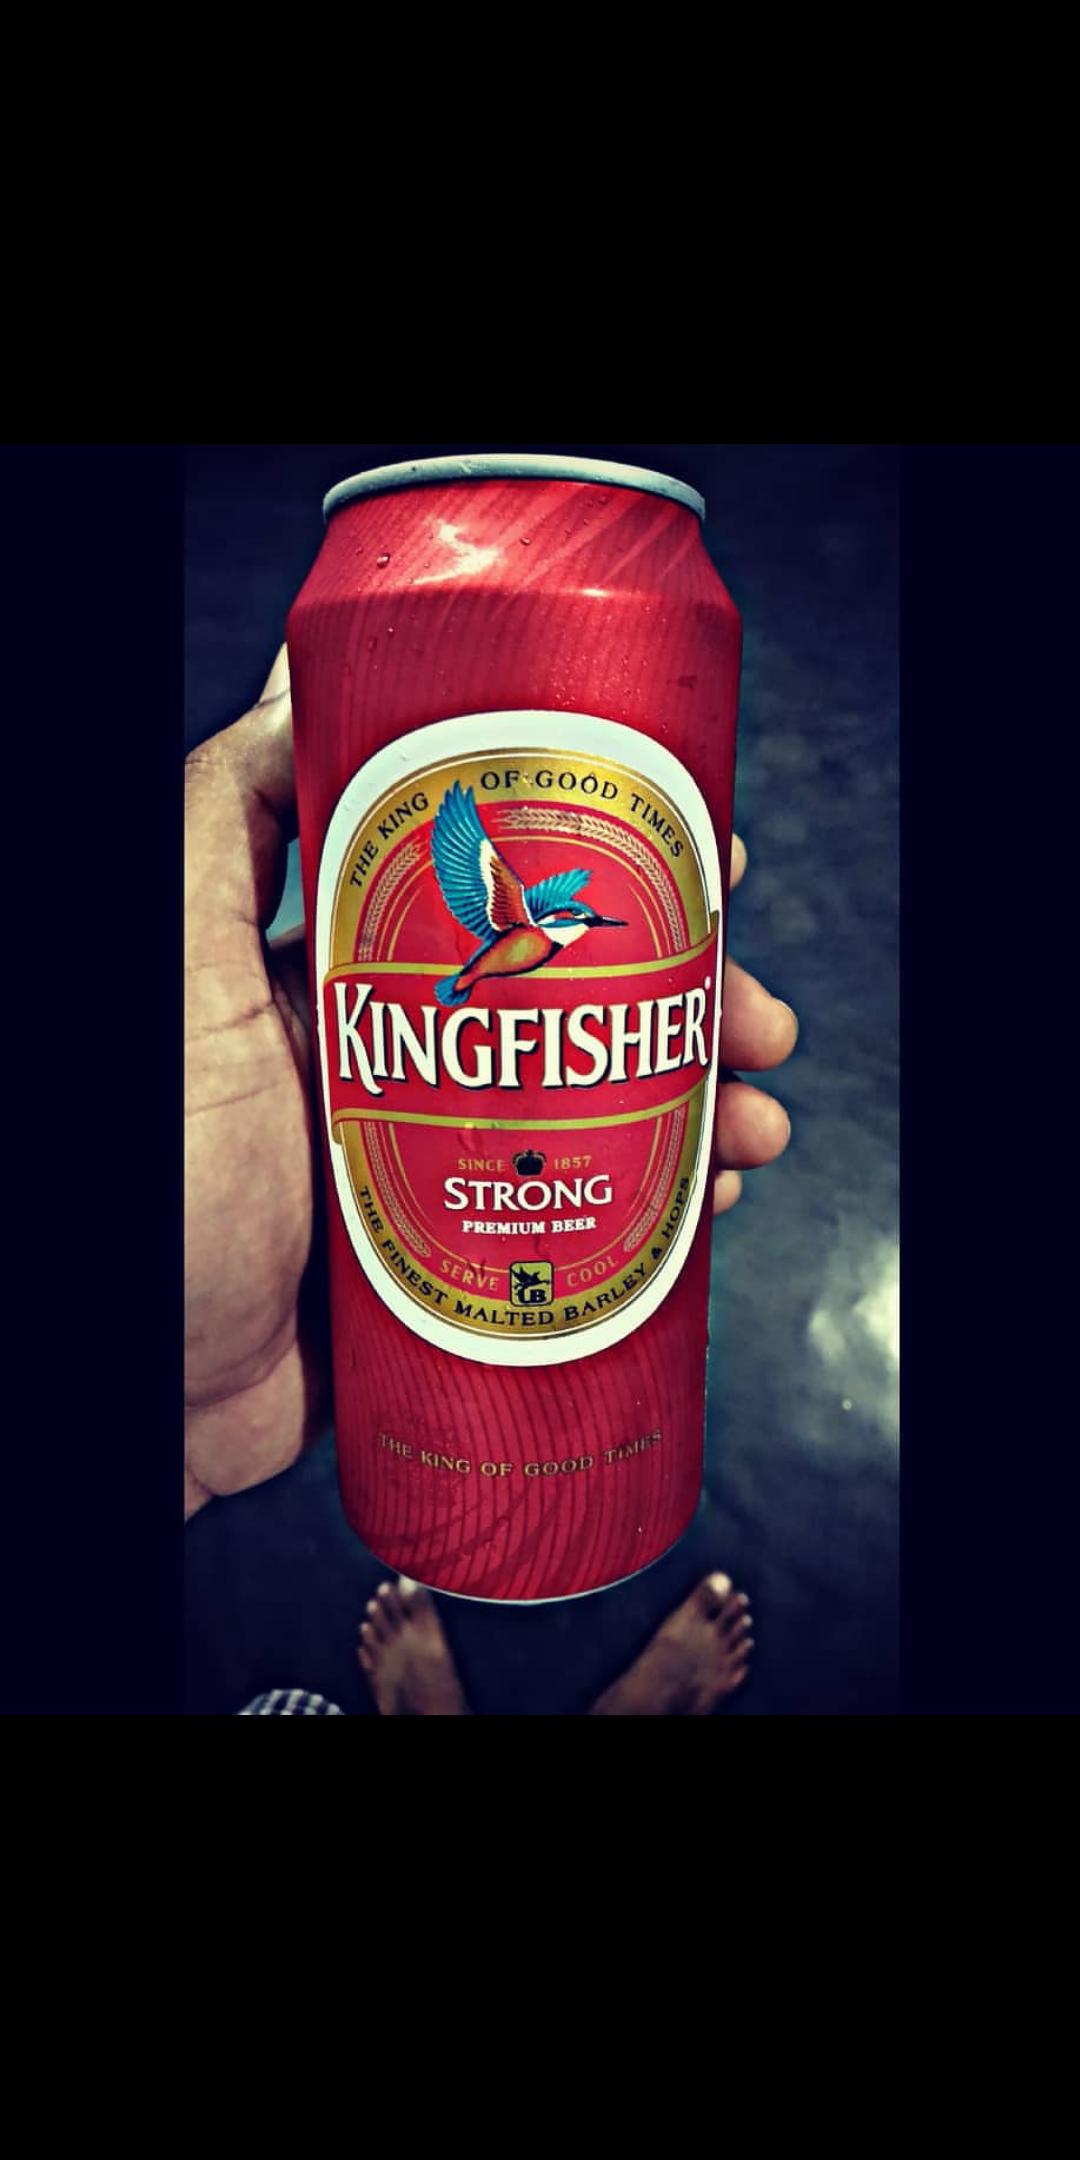 Strong Beer Malt San Pellegrino Kingfisher